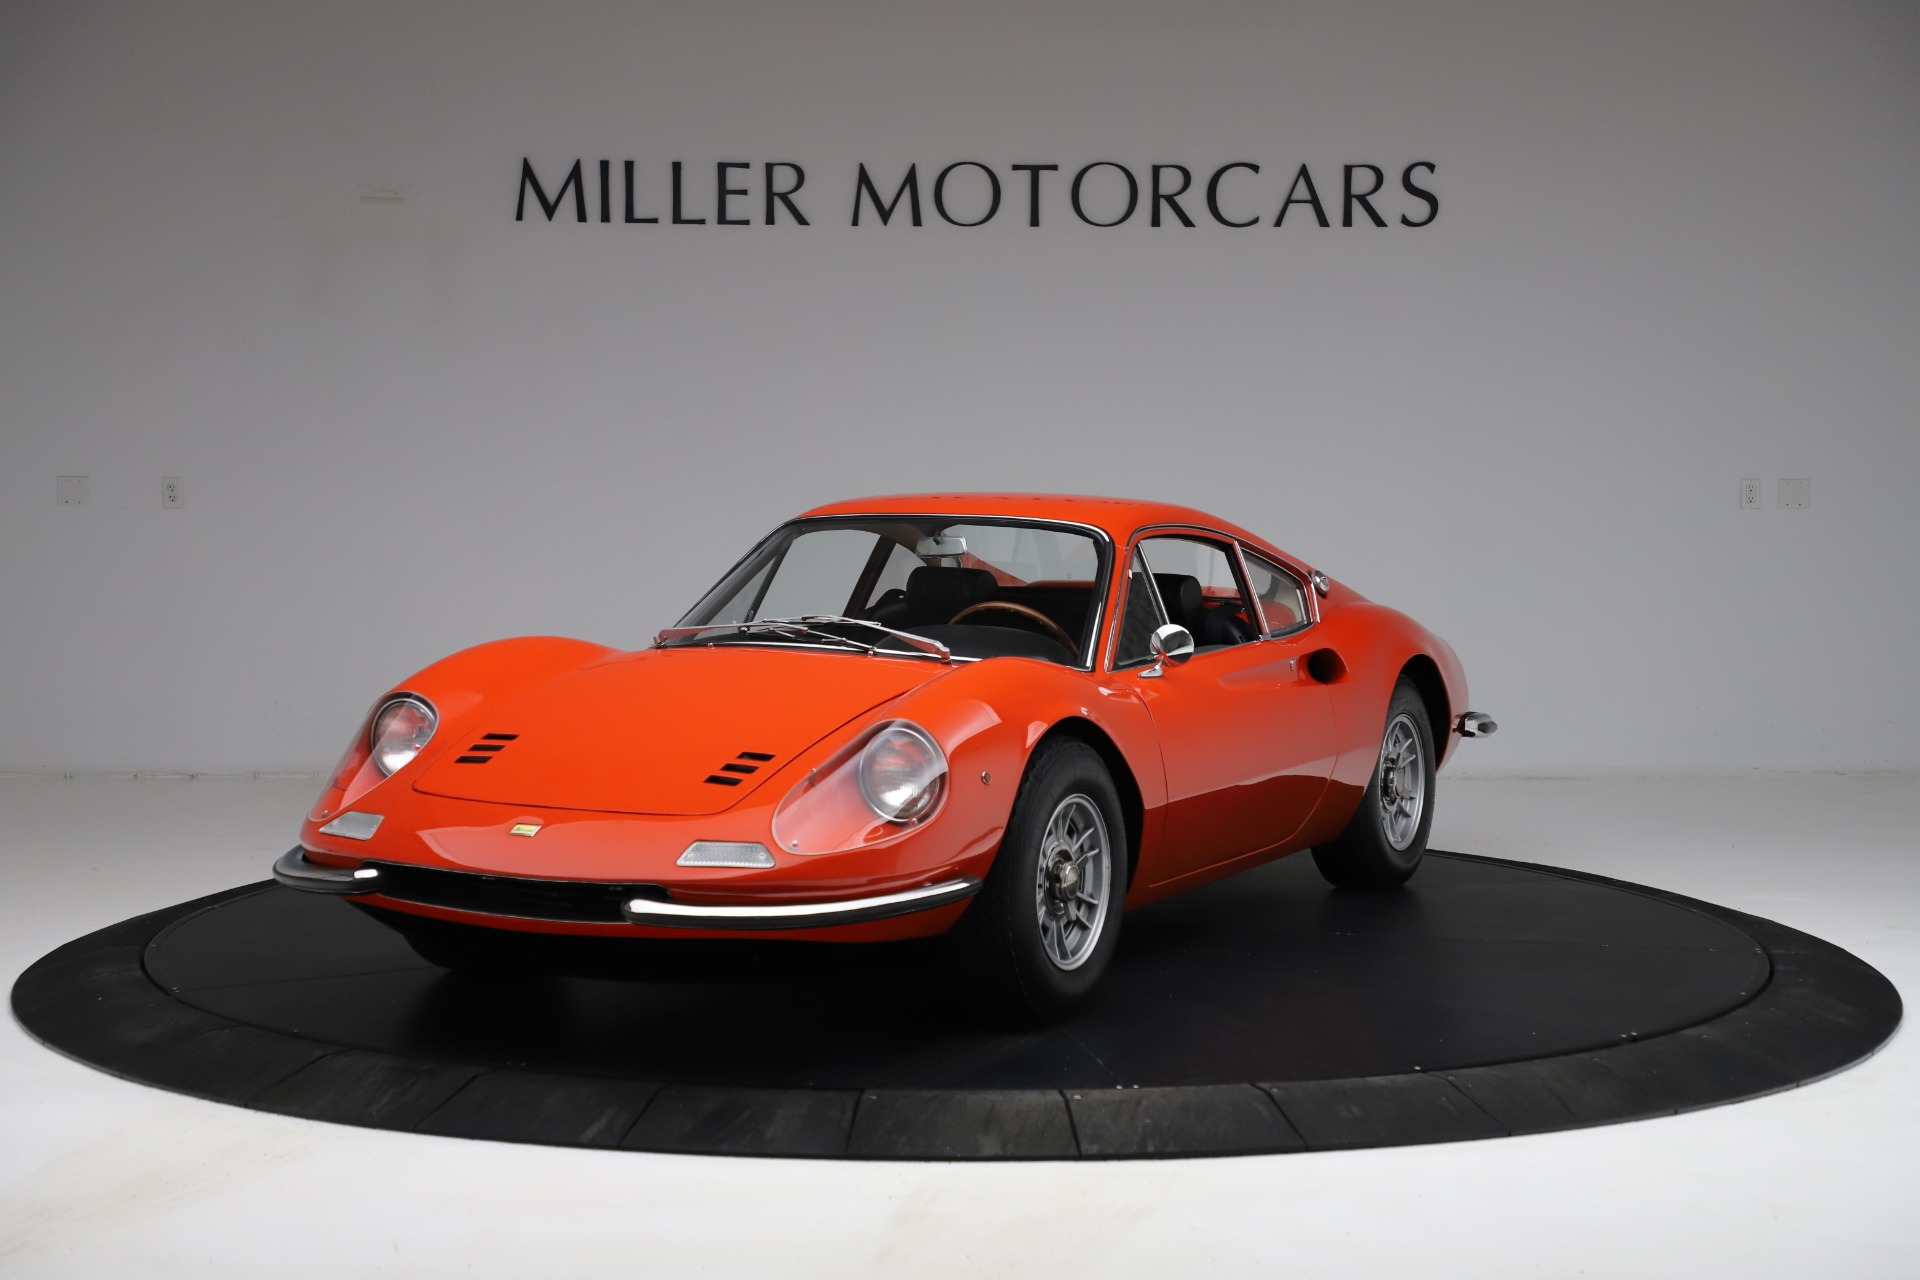 Used 1968 Ferrari 206 for sale $635,000 at Alfa Romeo of Greenwich in Greenwich CT 06830 1